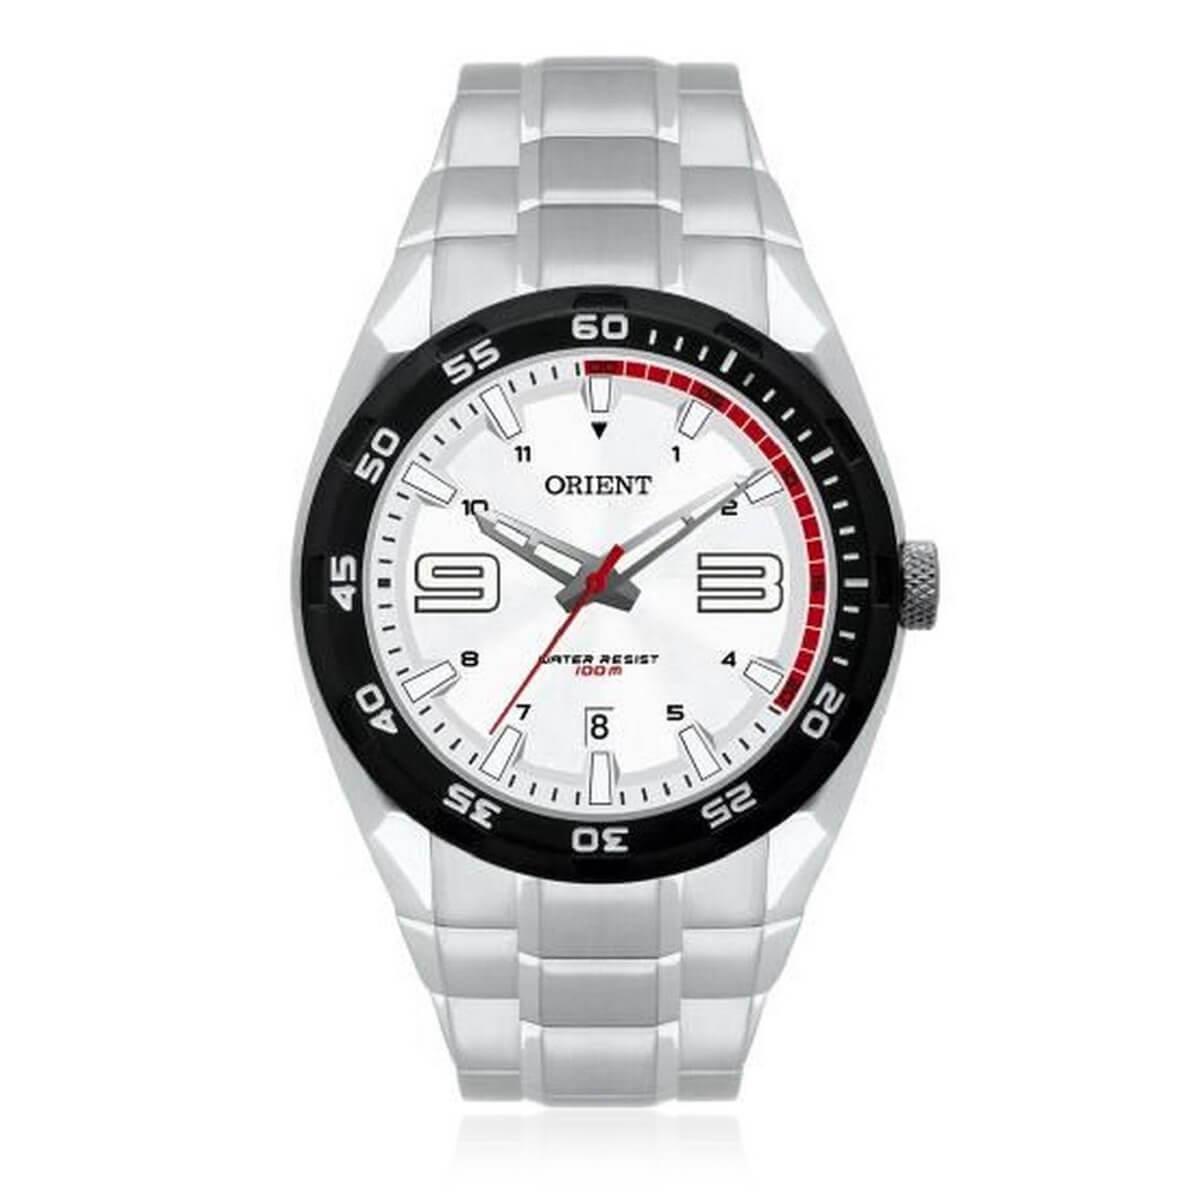 ca9ee27fa6f Relógio Masculino Orient Analógico MBSS1185 SVSX Aço fundo Branco Produto  não disponível